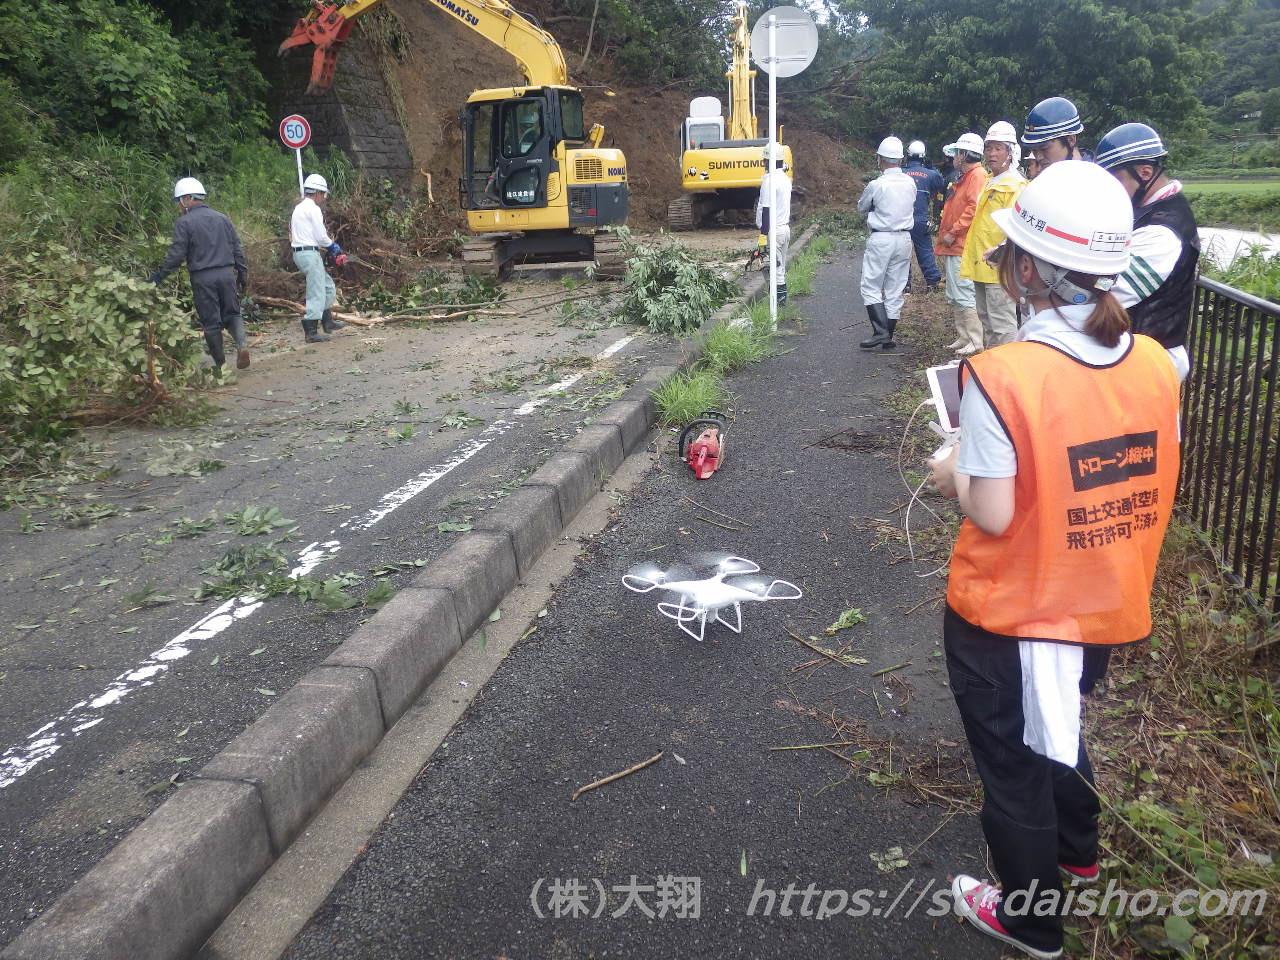 黒田土砂災害ドローン撮影